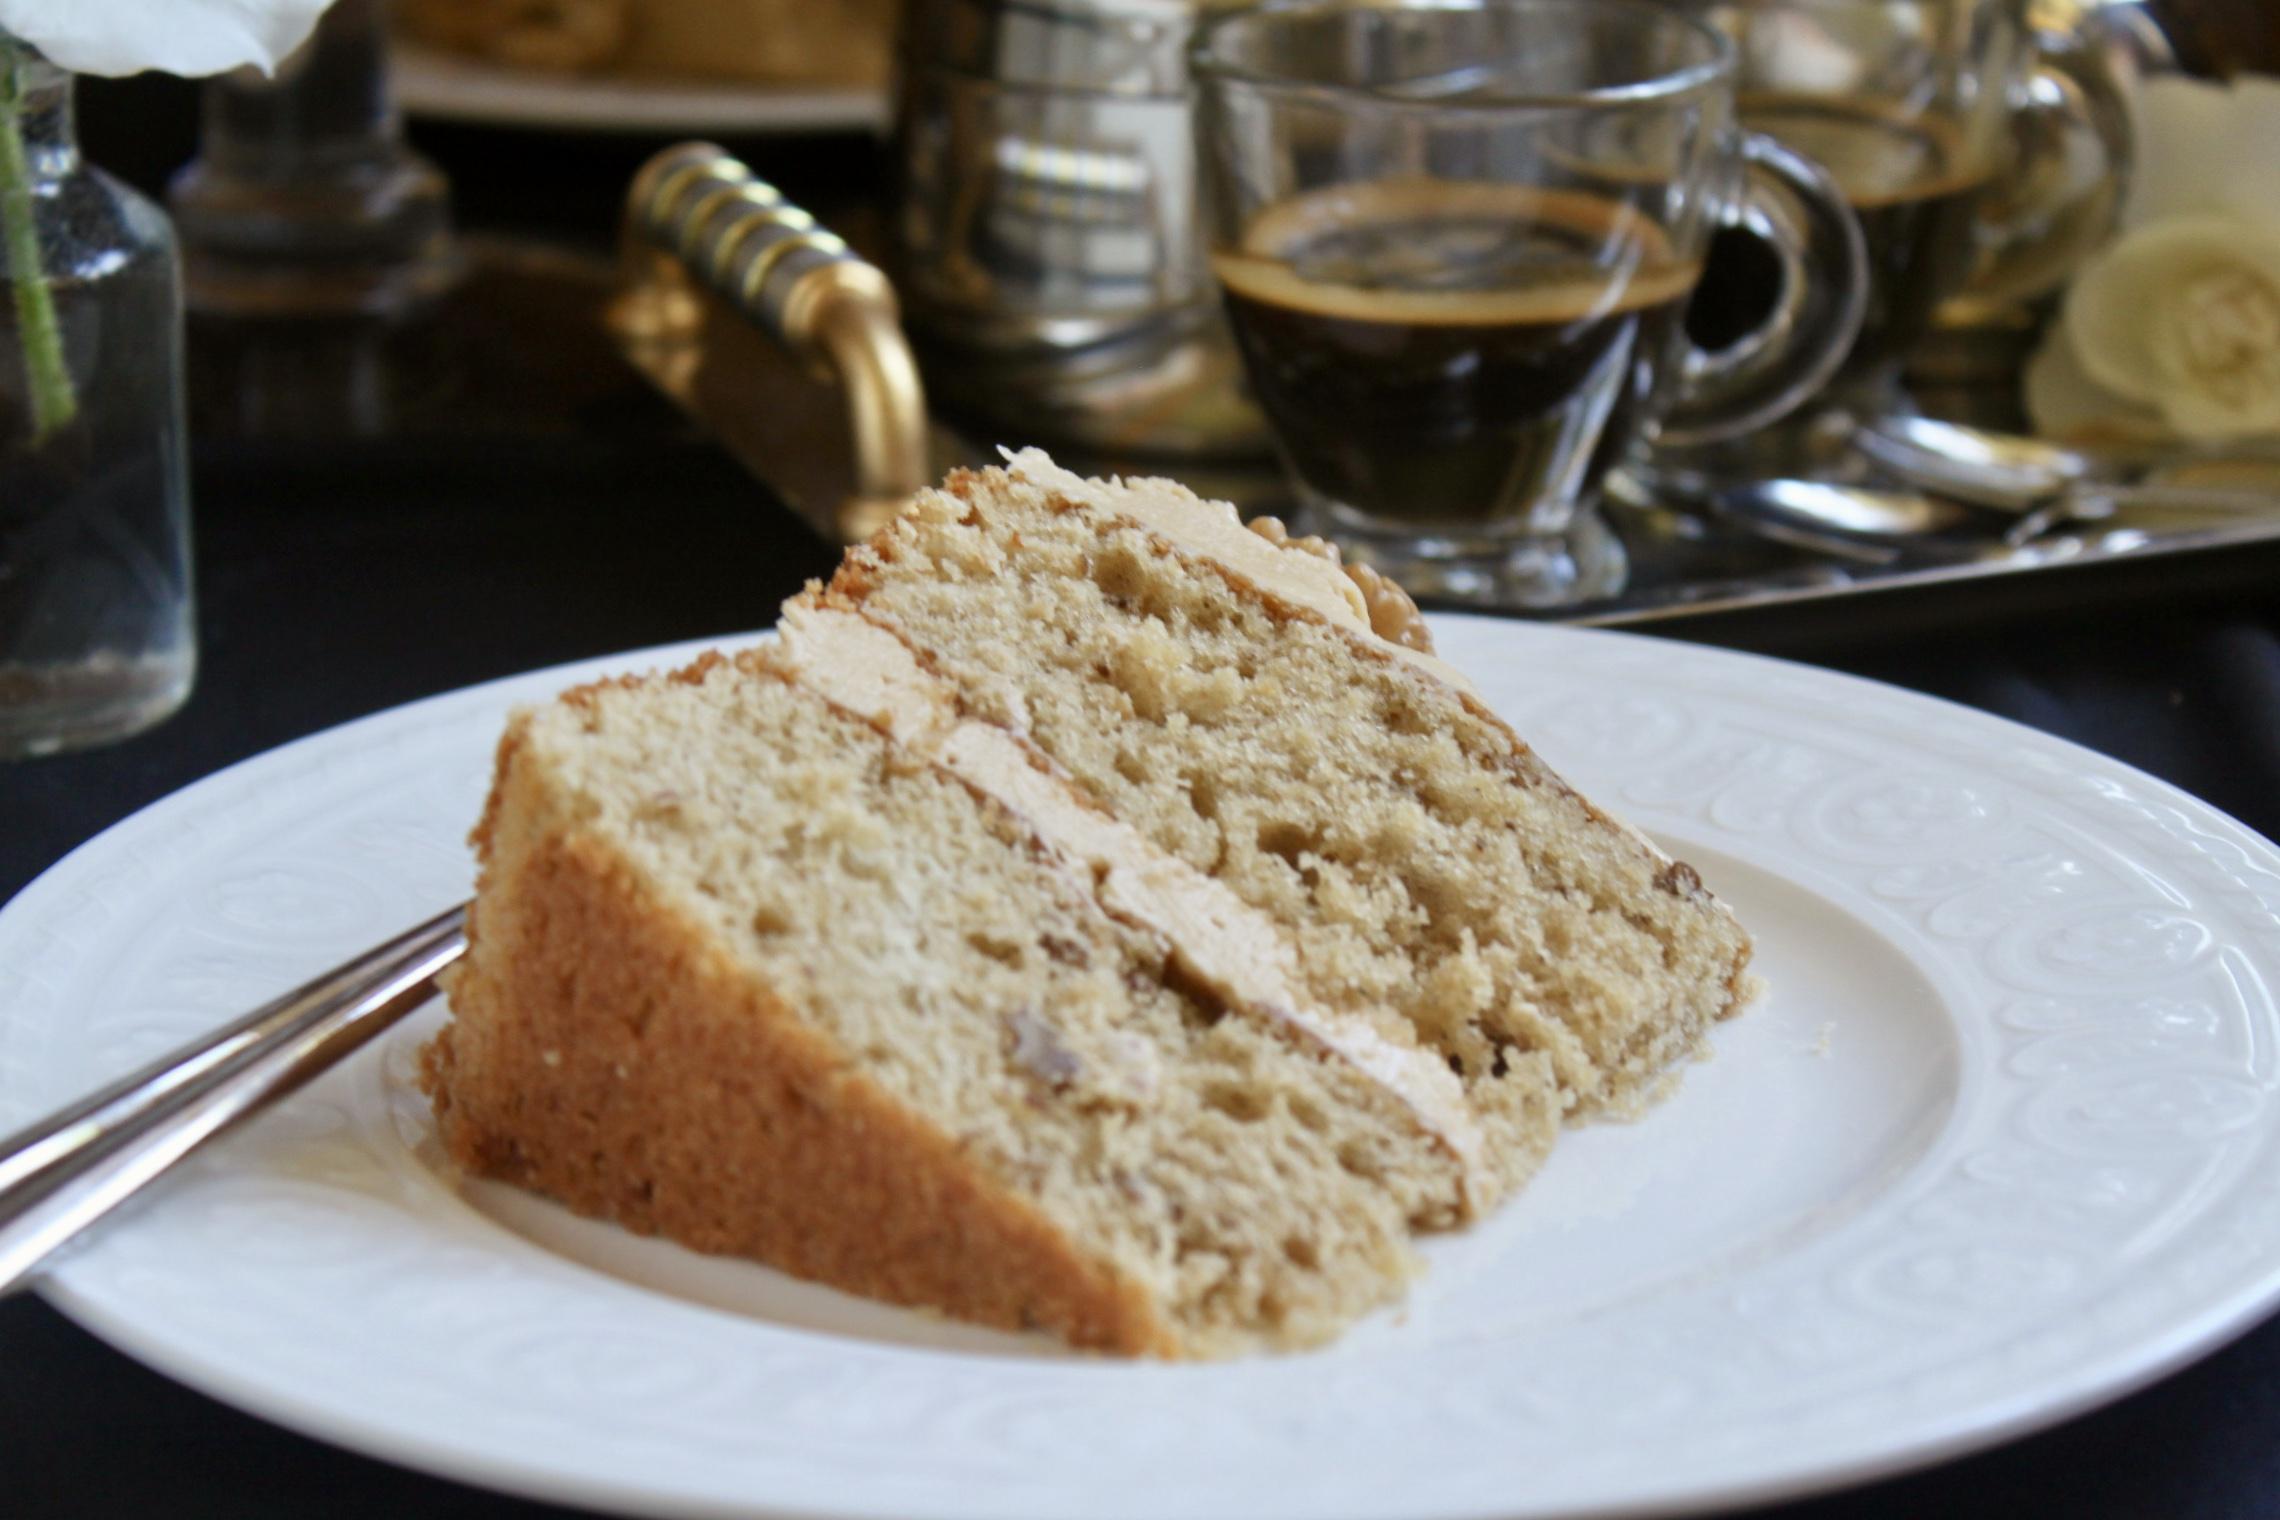 slice of coffee and walnut cake